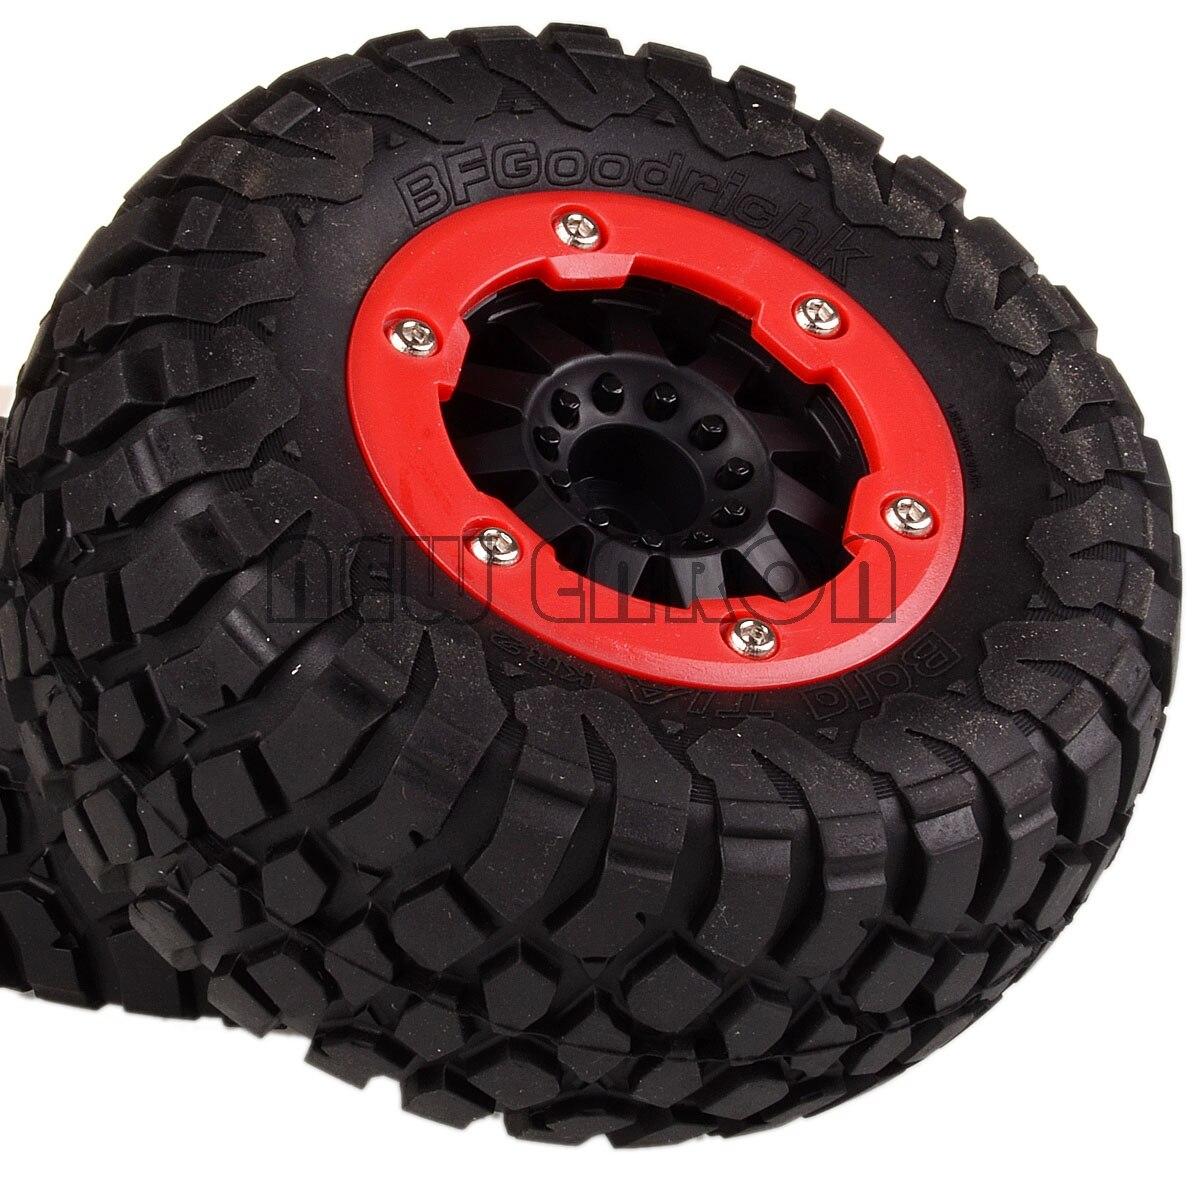 NEW ENRON 4PCS Course Truck <font><b>Tire</b></font> & Bead-Lock Wheel Hub FOR 10SC HPI